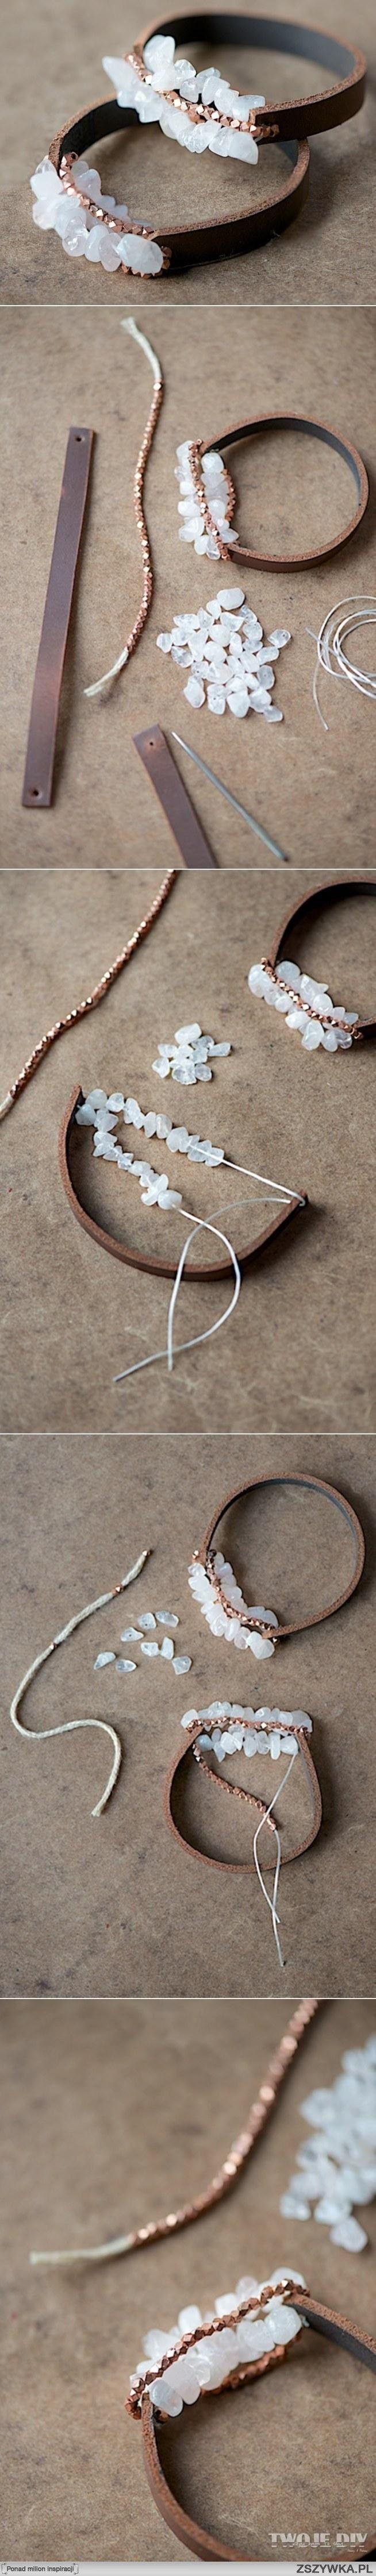 Community Post: 24 Super Easy DIY Bracelets